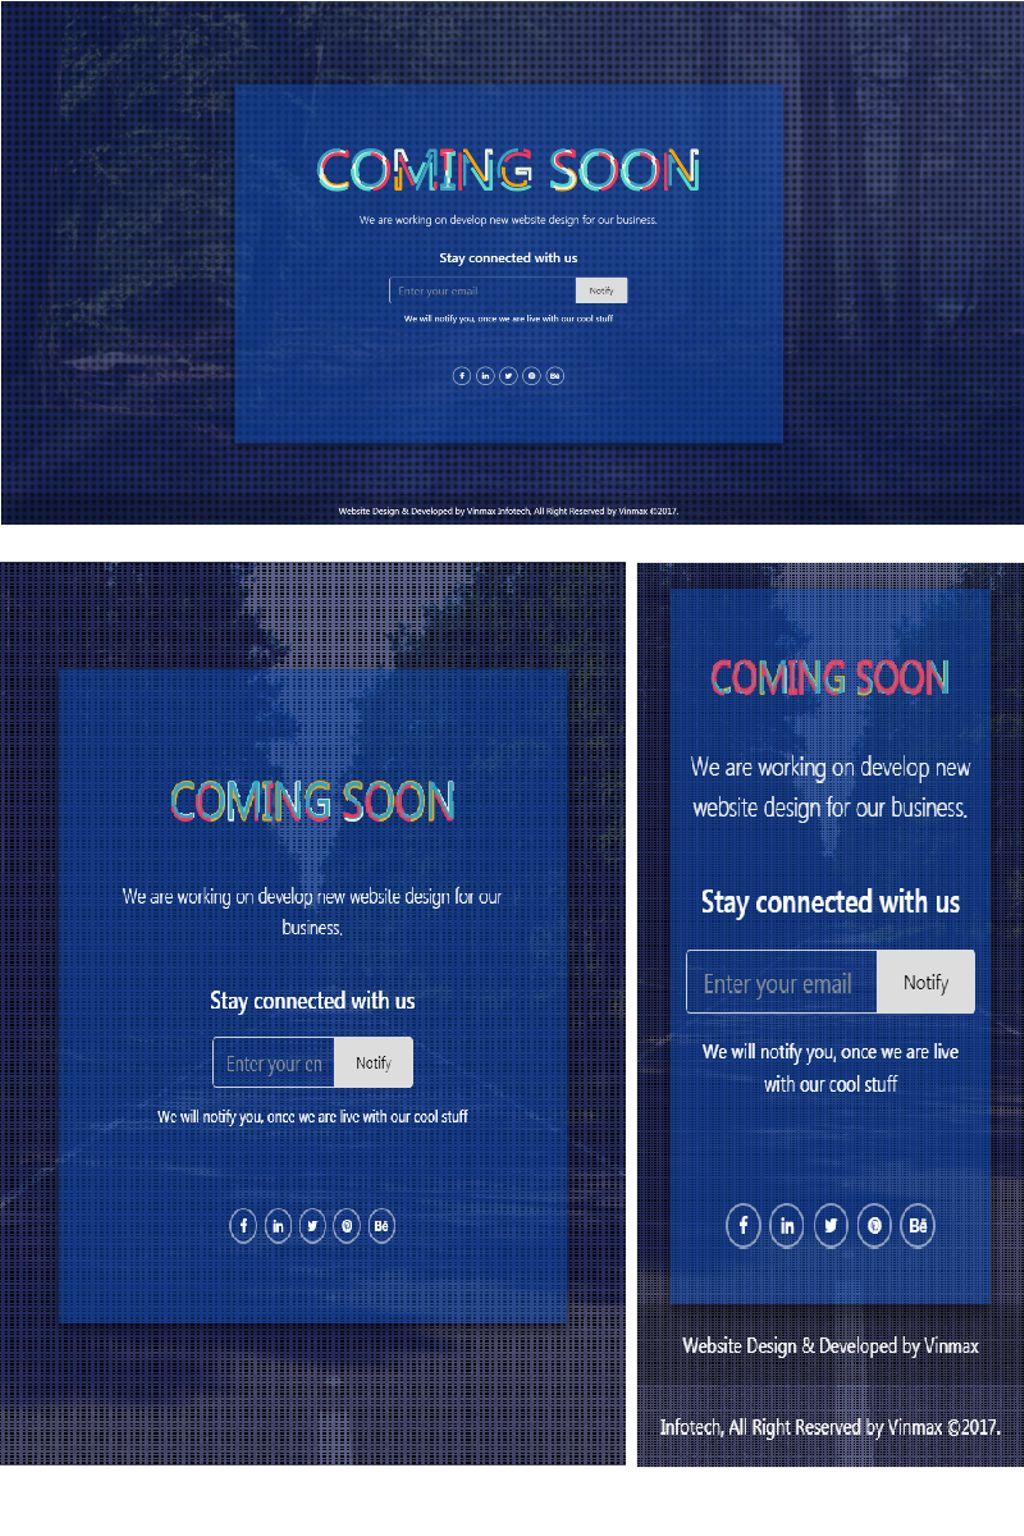 Max Coming Soon Page - Bootstrap 4 Responsive HTML Páginas Especiais №67311